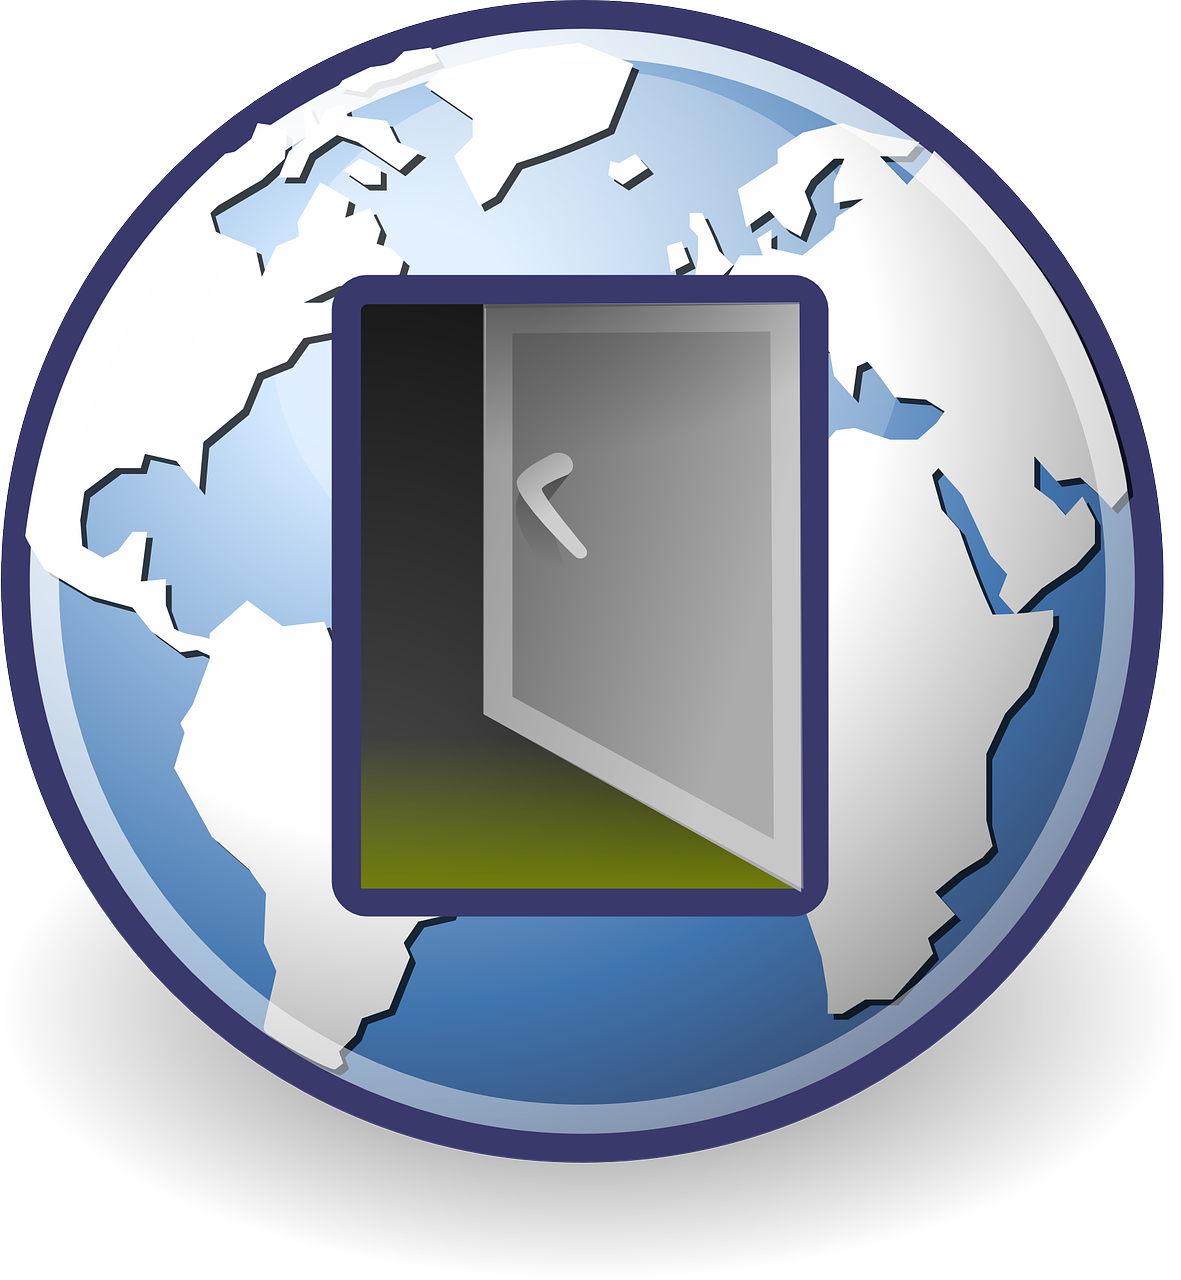 Network Exit Logout Sign Off transparent image Blocking